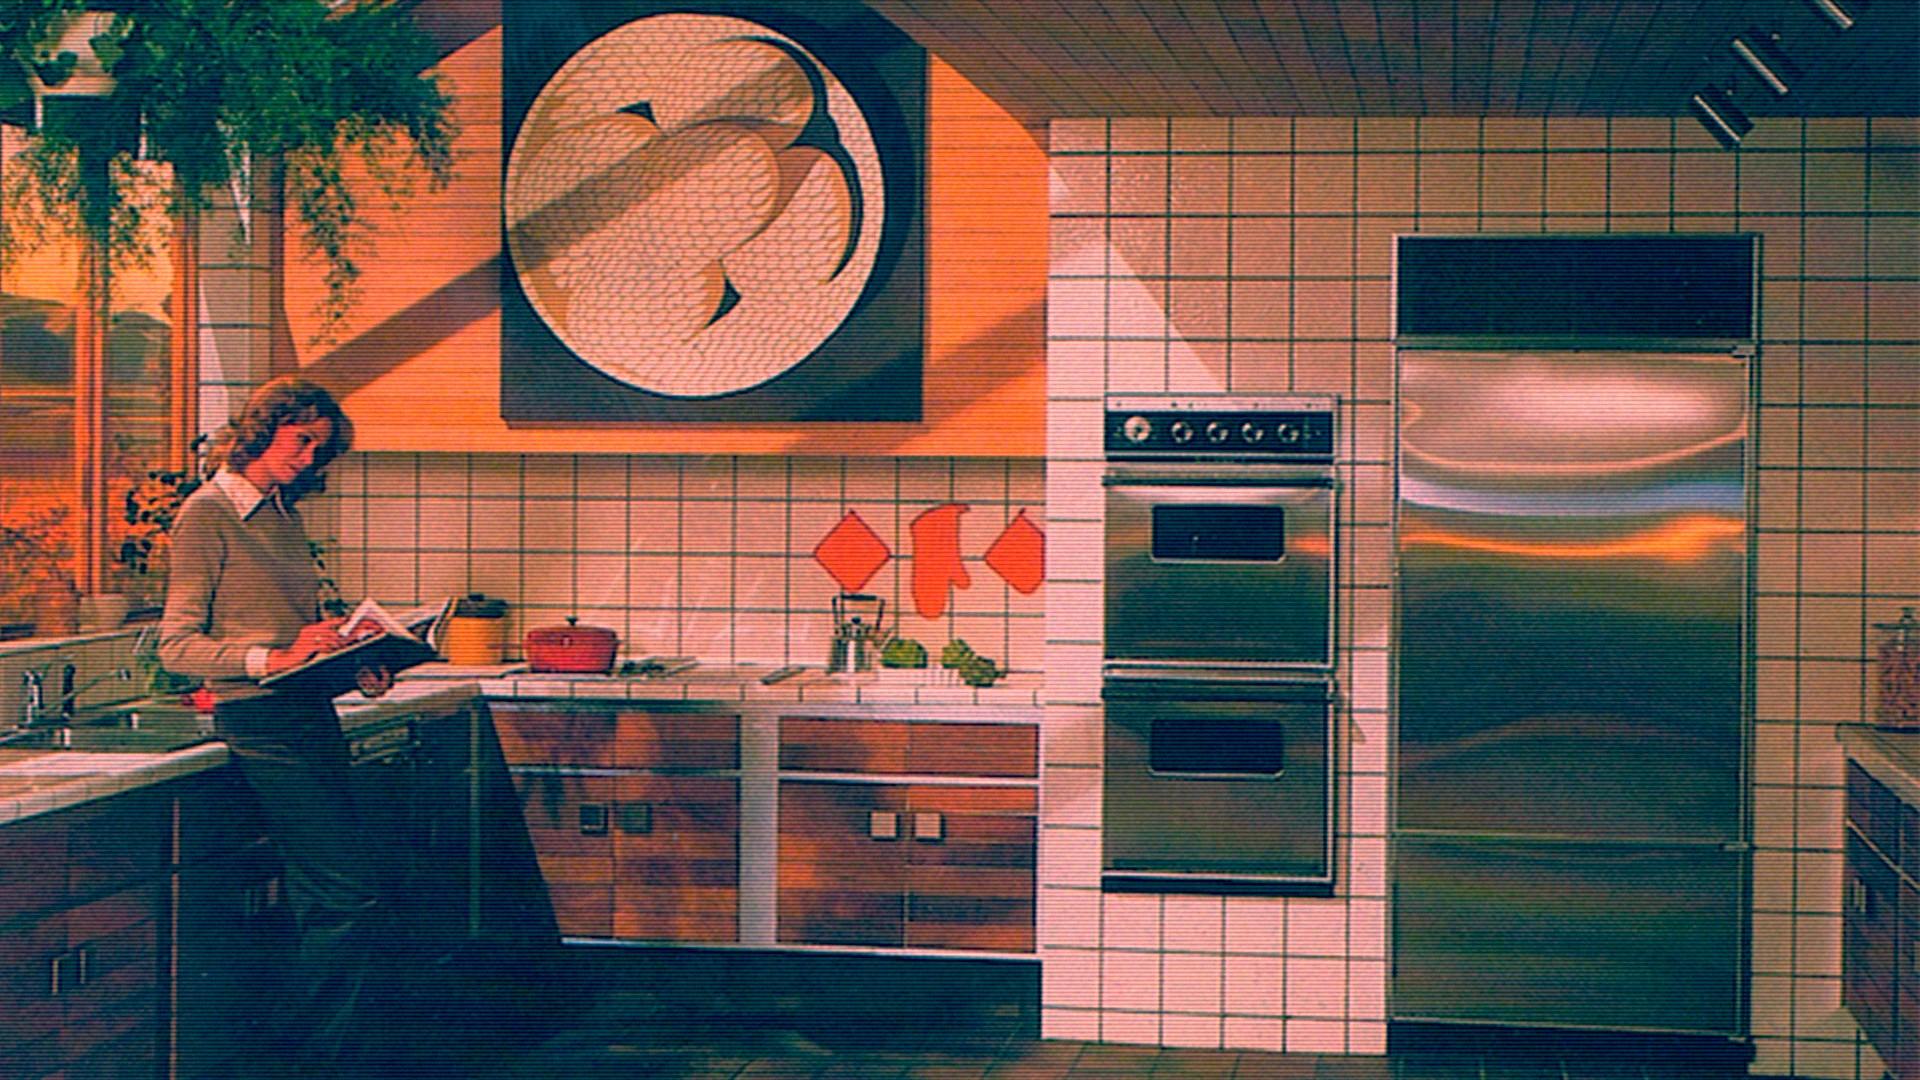 Vaporwave wallpaper 1920x1080 ·① Download free awesome ...